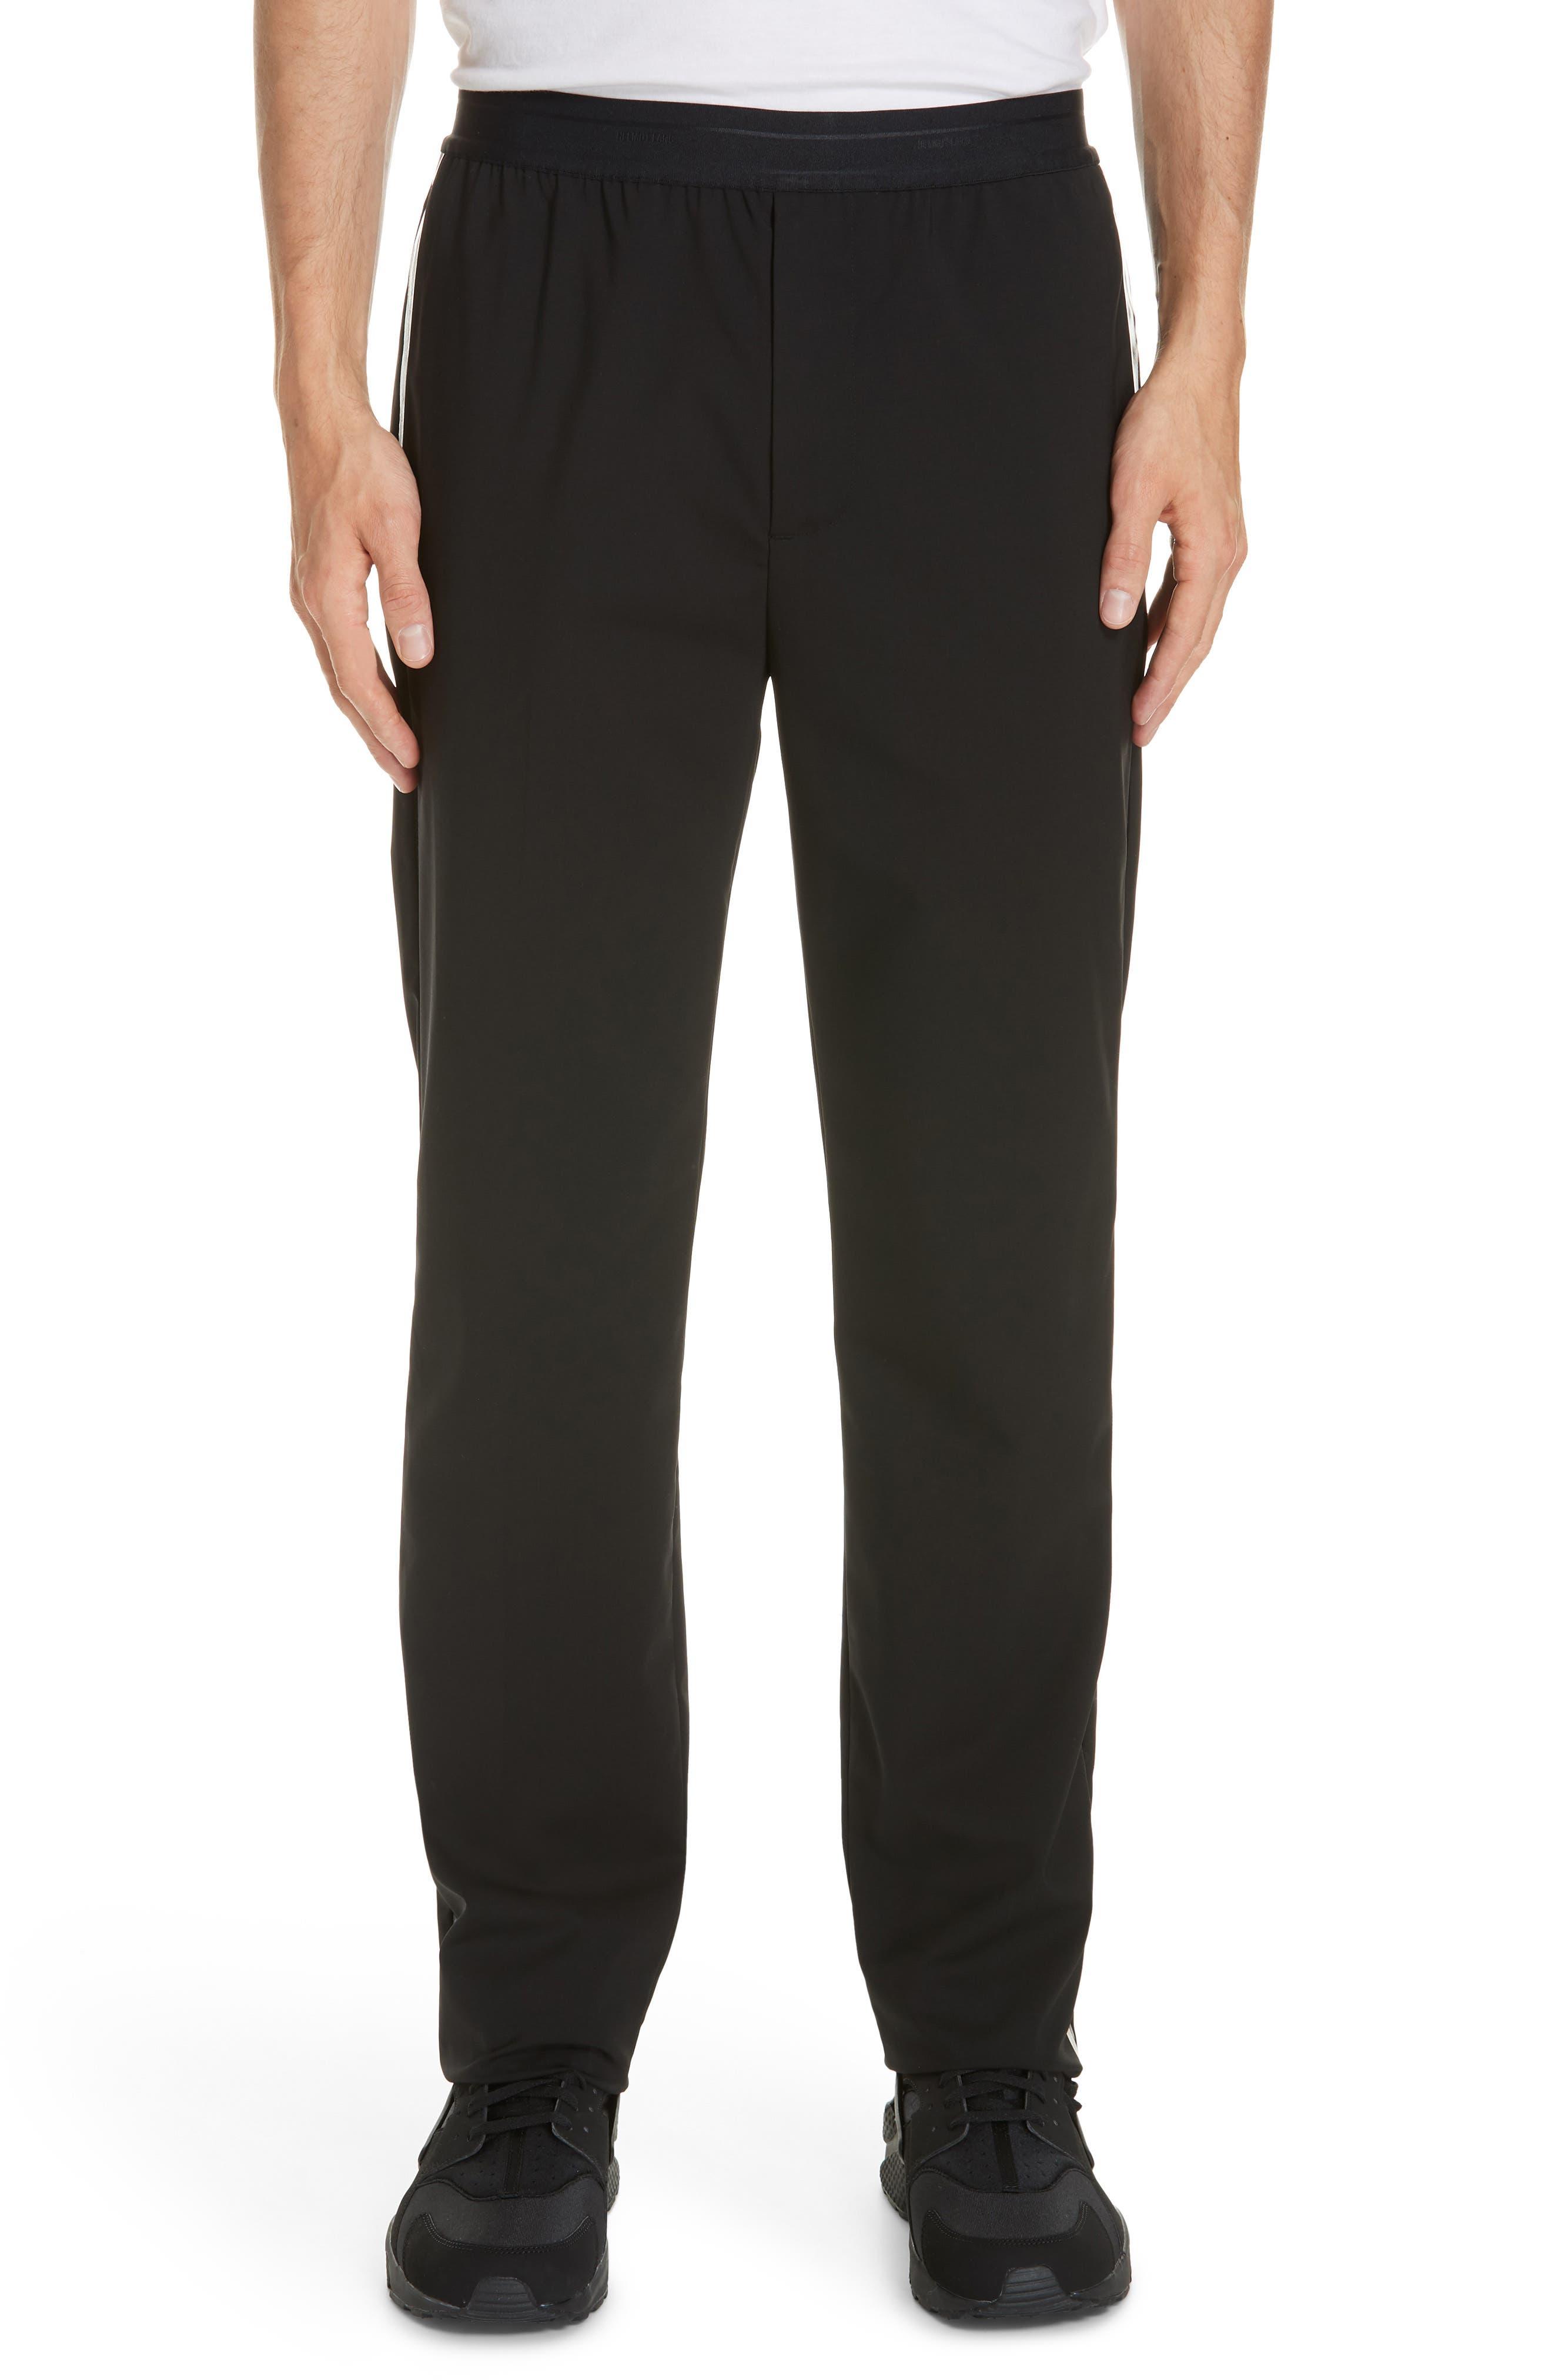 HELMUT LANG Wool Pants, Main, color, BLACK ON BLACK